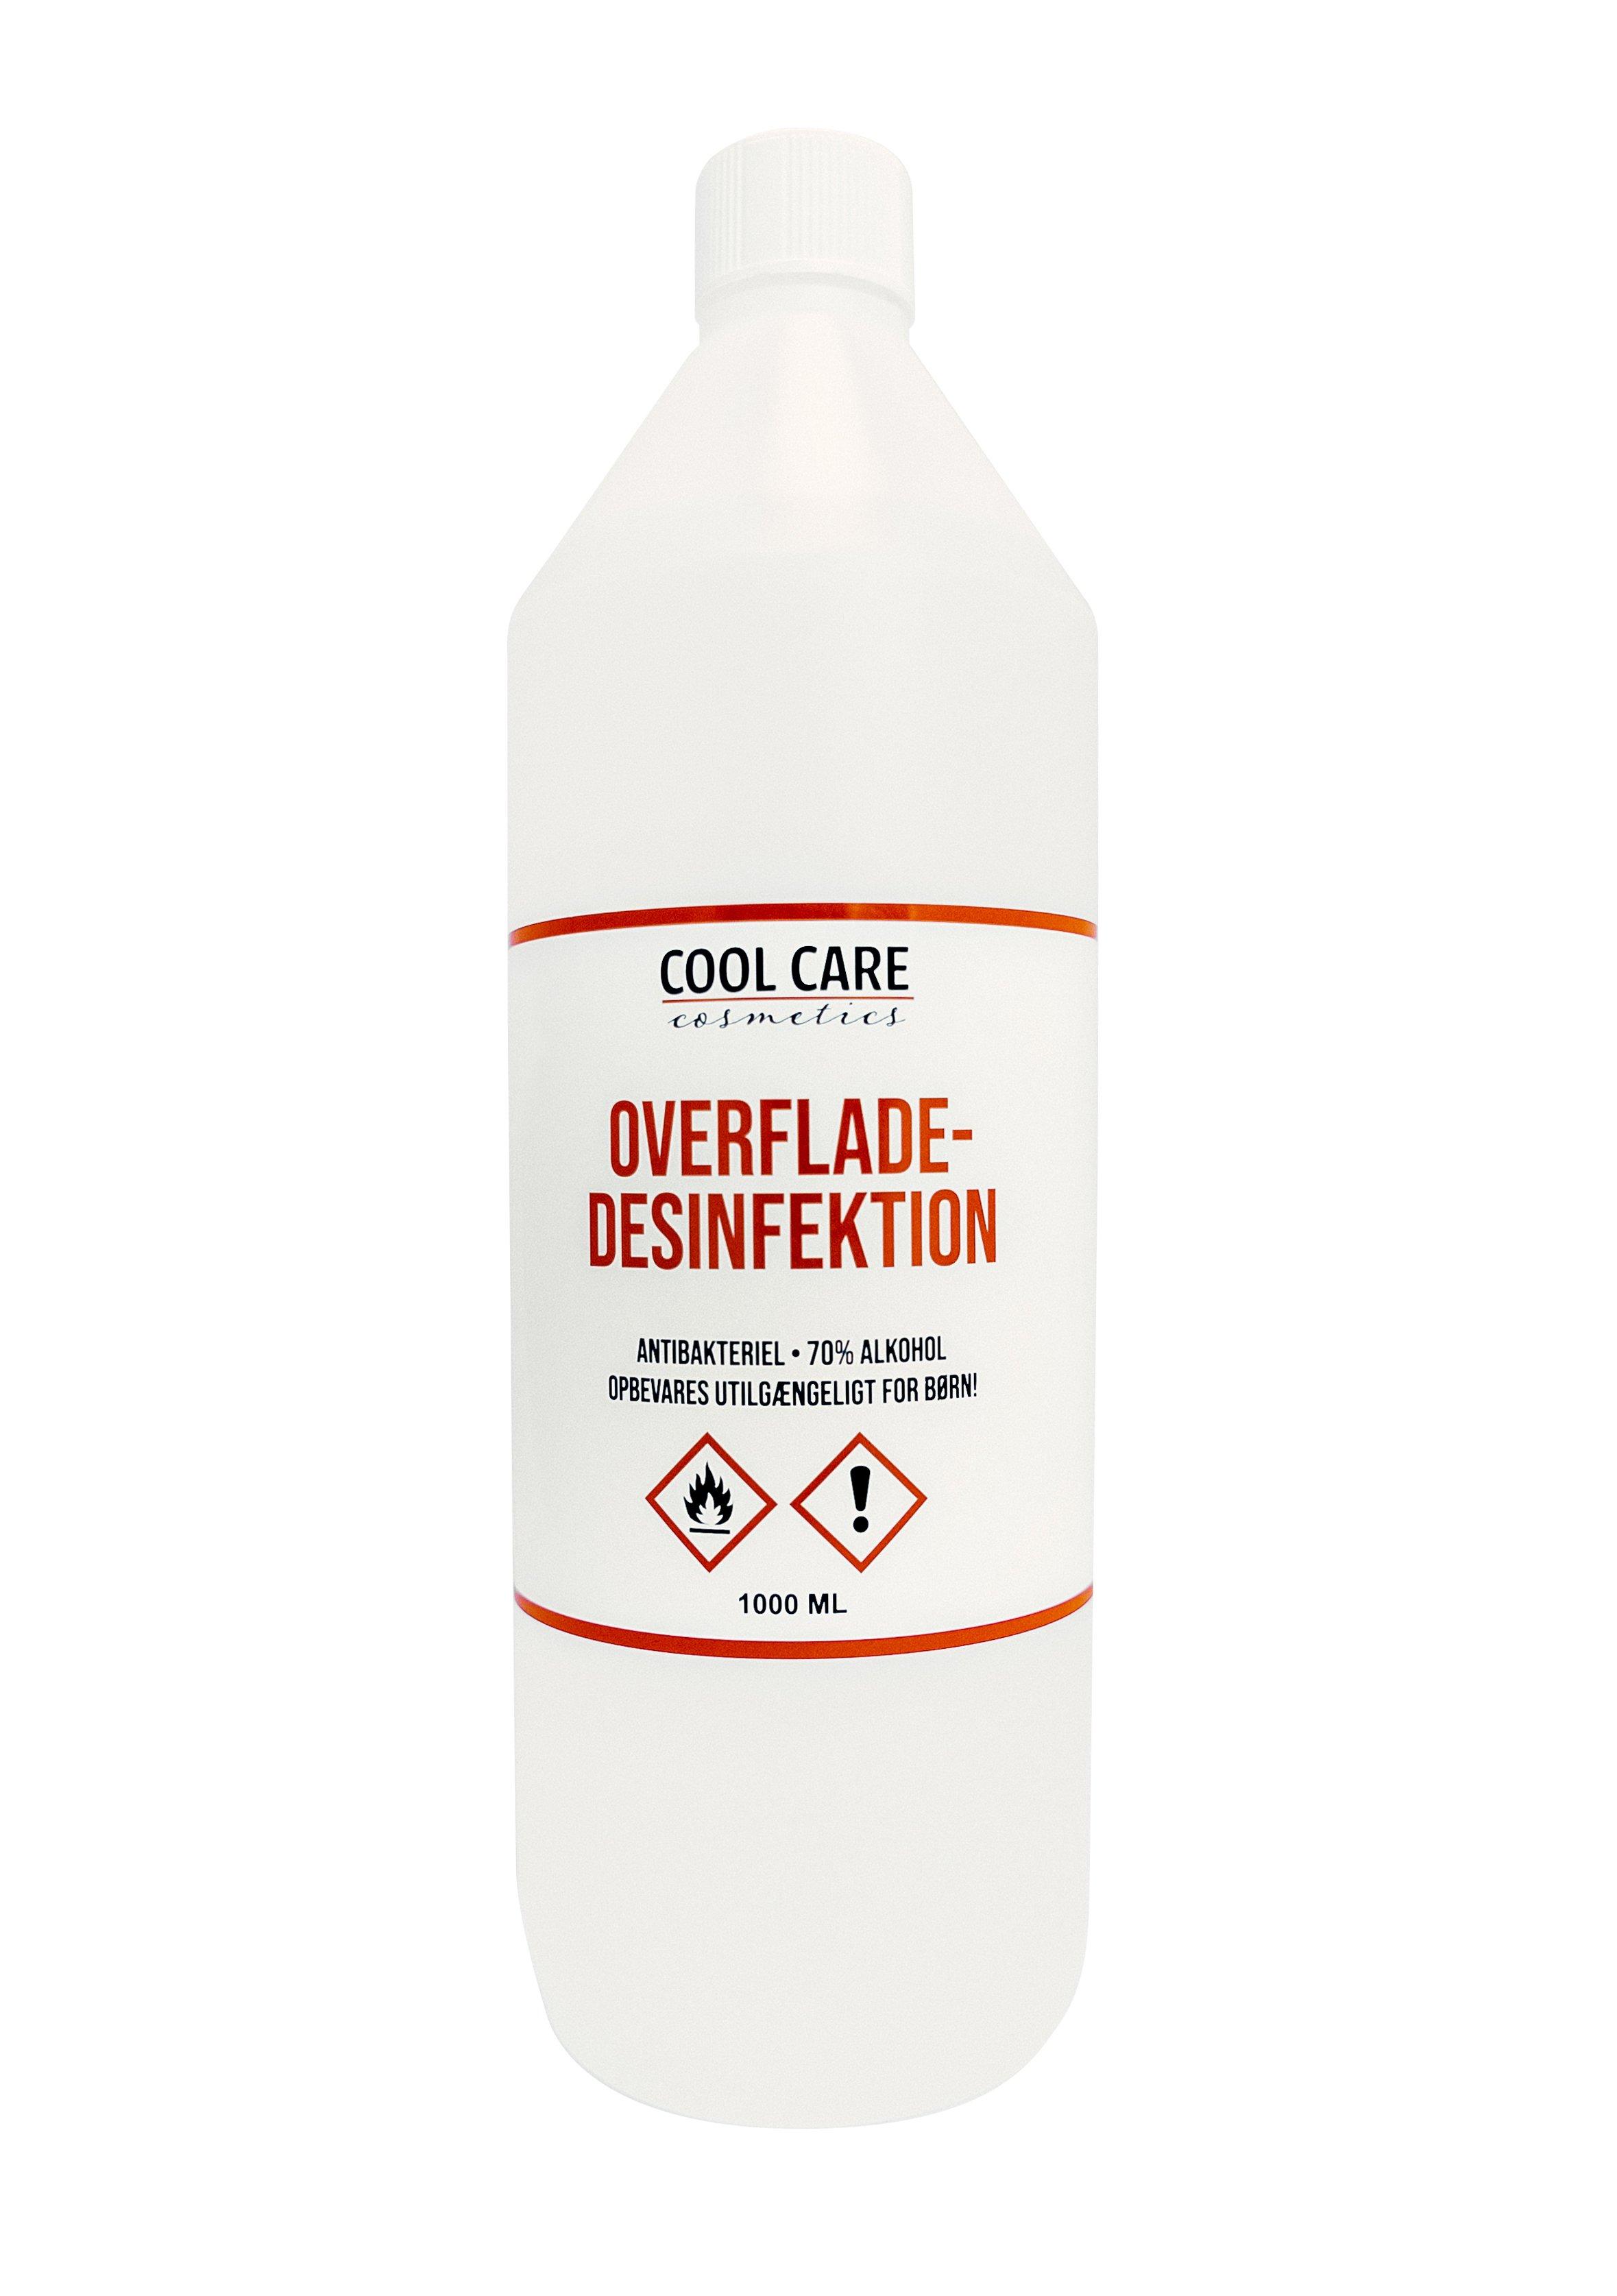 Cool Care - Overflade Desinfektion (70%) 1 L